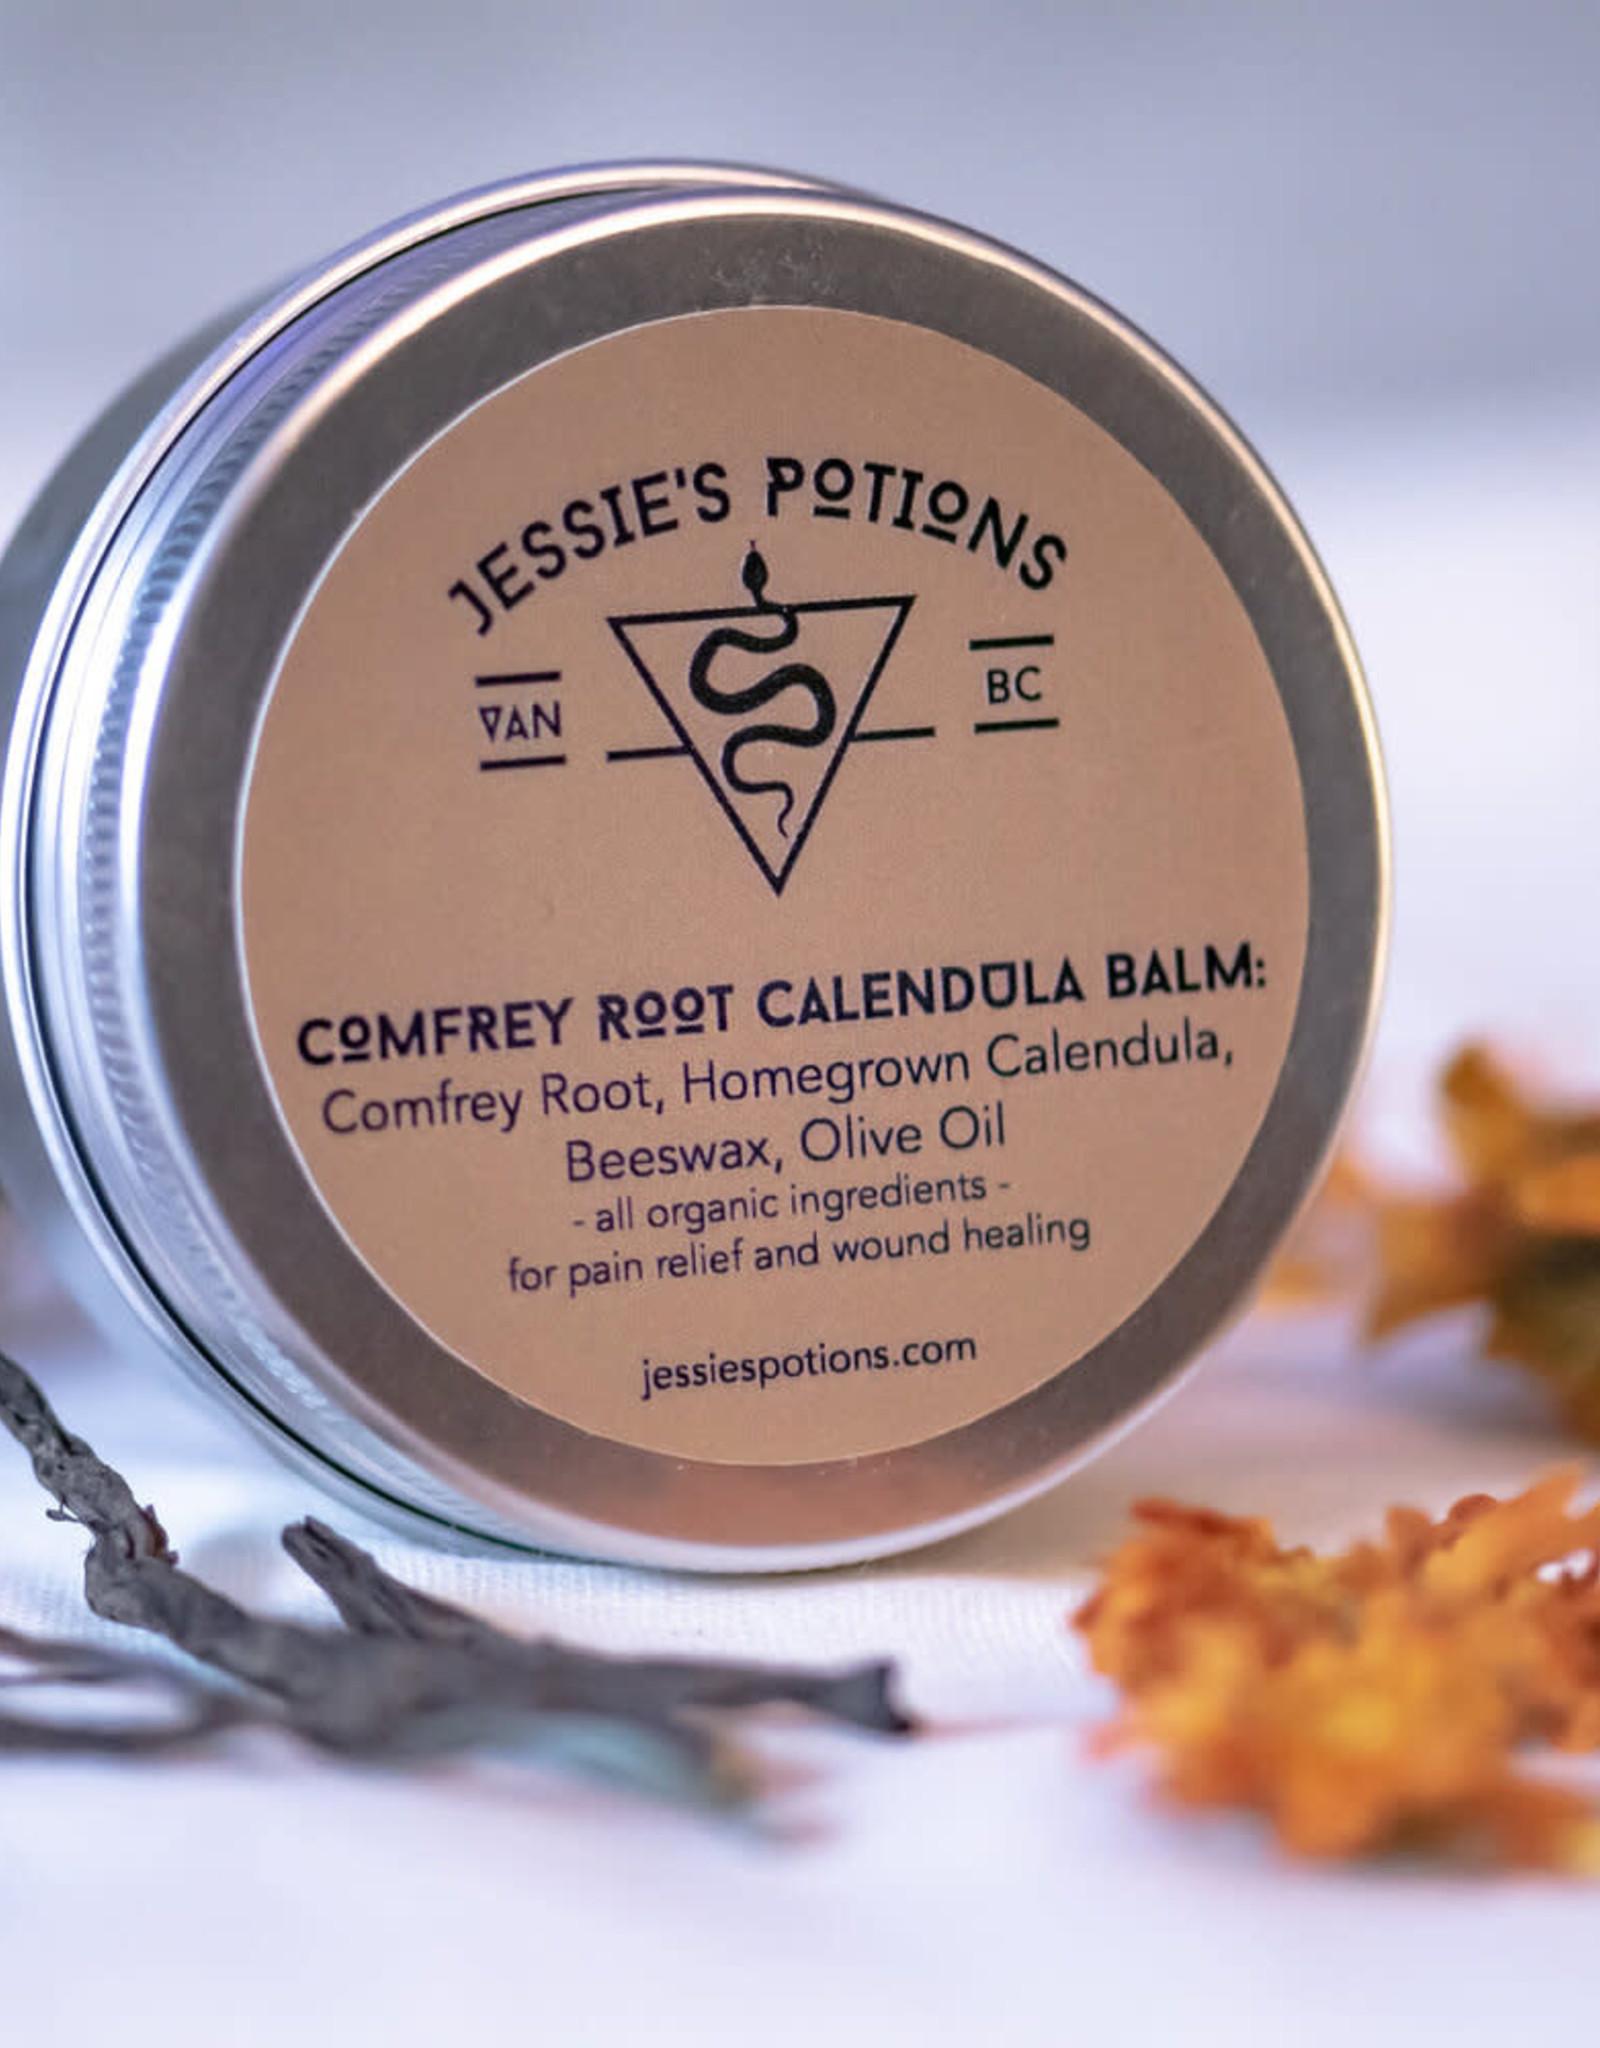 Jessie's Potions Comfrey Root Calendula Balm, Jessie's Potions